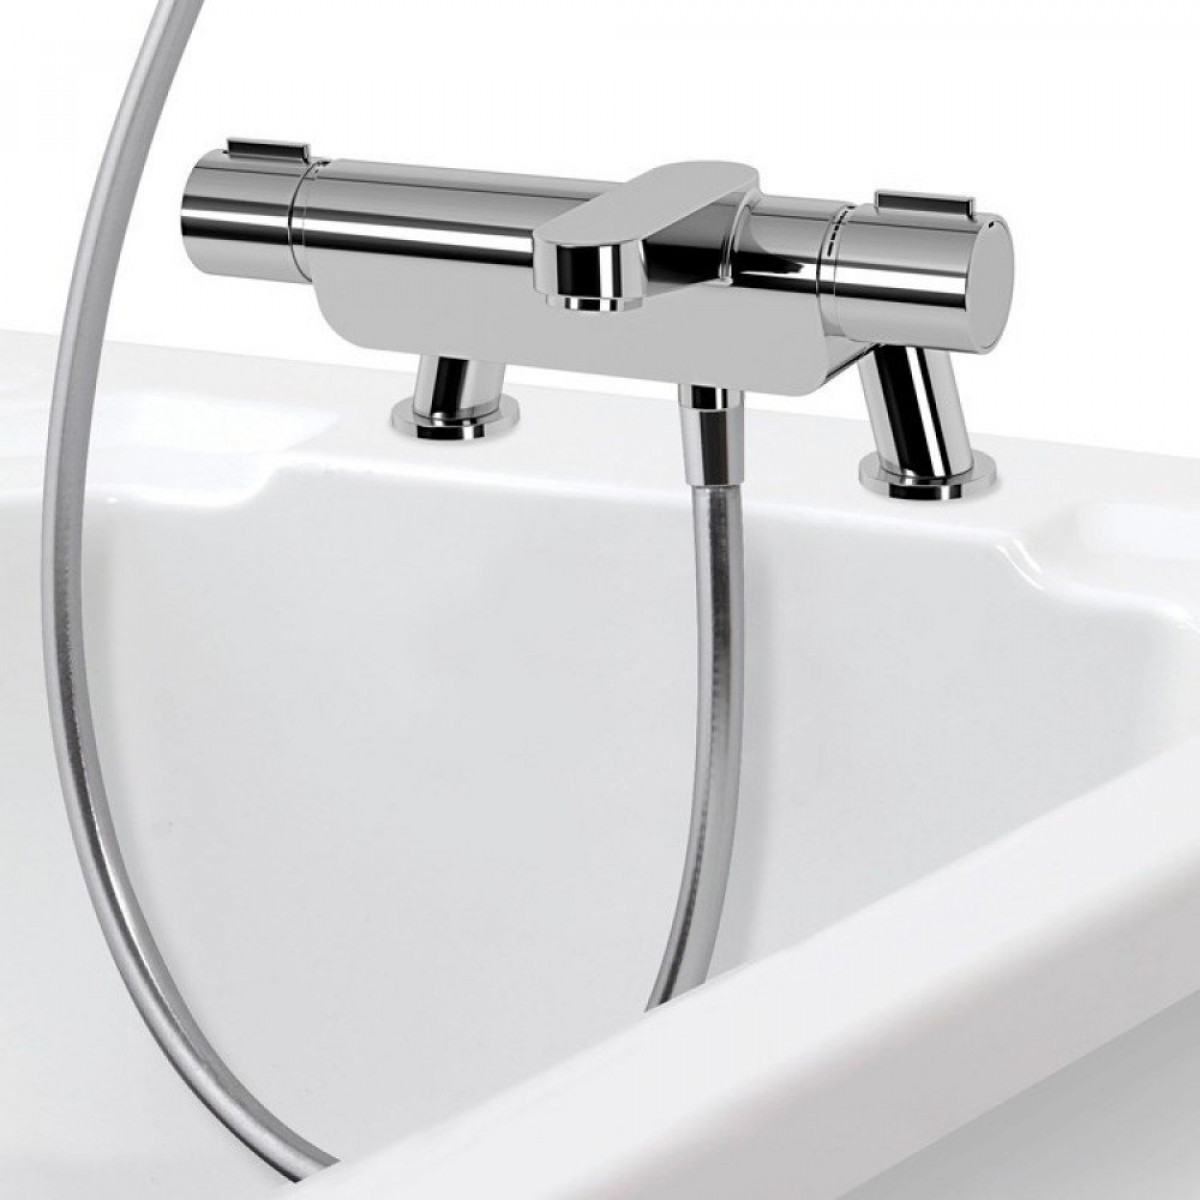 aqualisa midas 220 bath shower mixer md220bsm